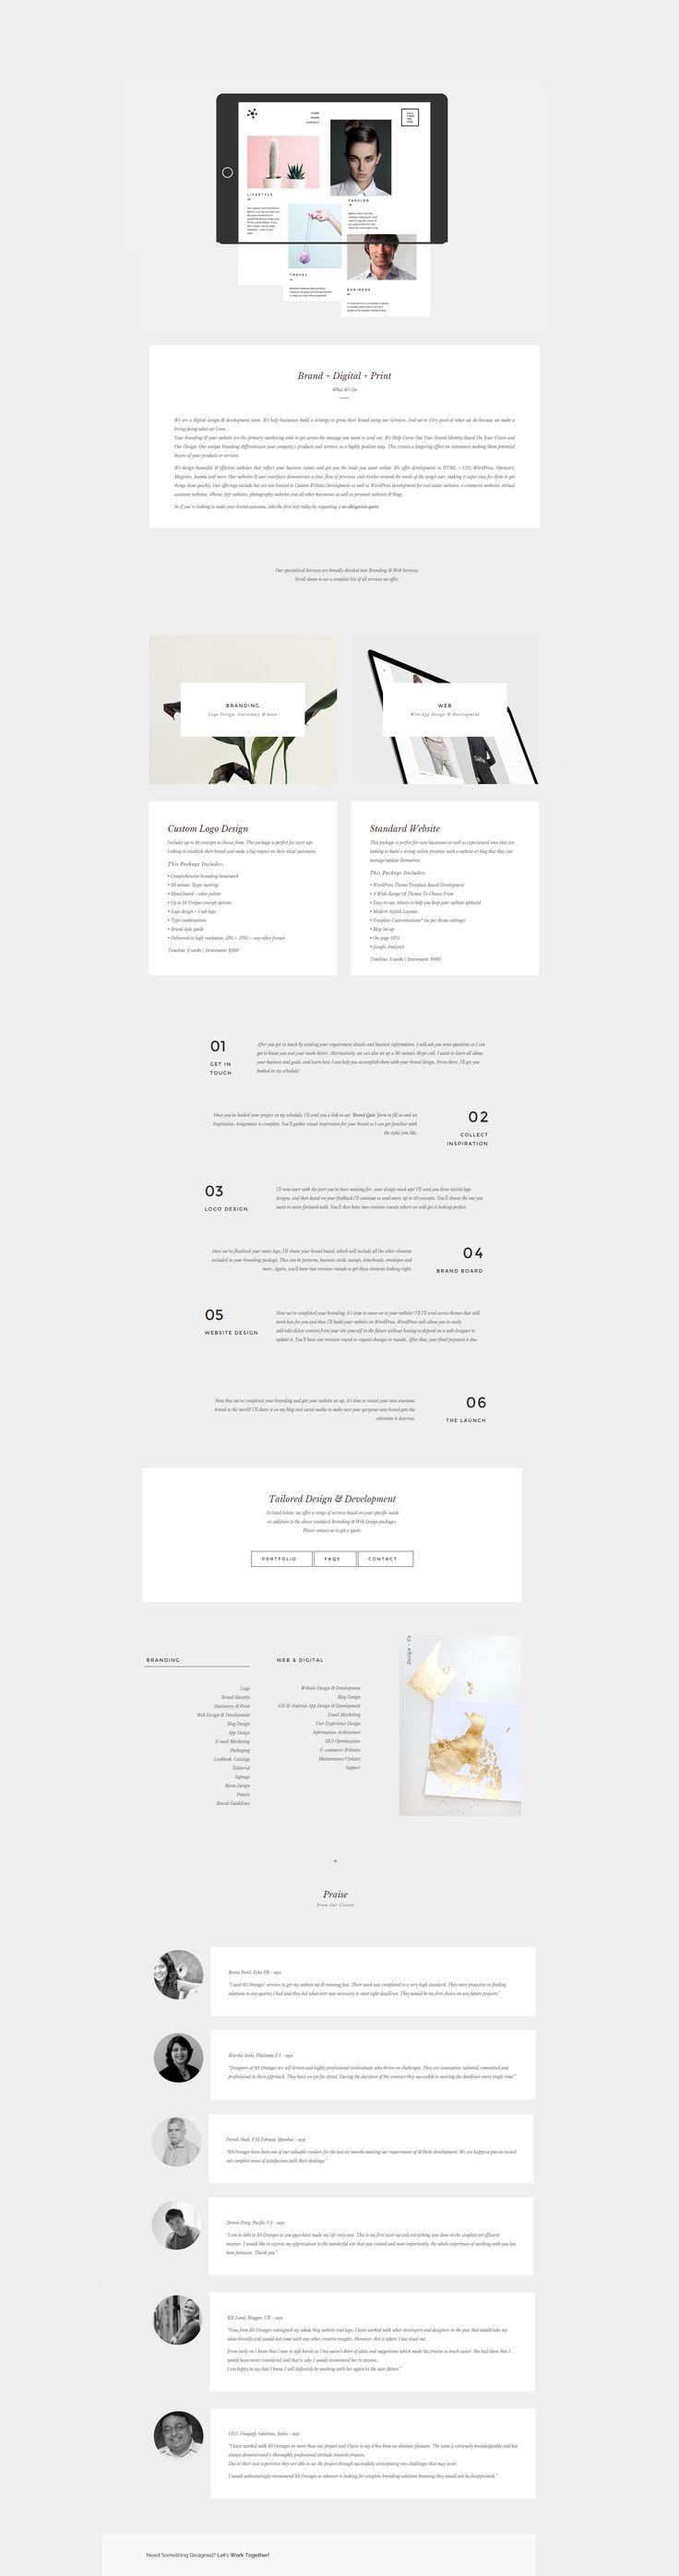 #logo #brand #identity #print #web #webdesign #webdevelopment #emailmarketing [...]